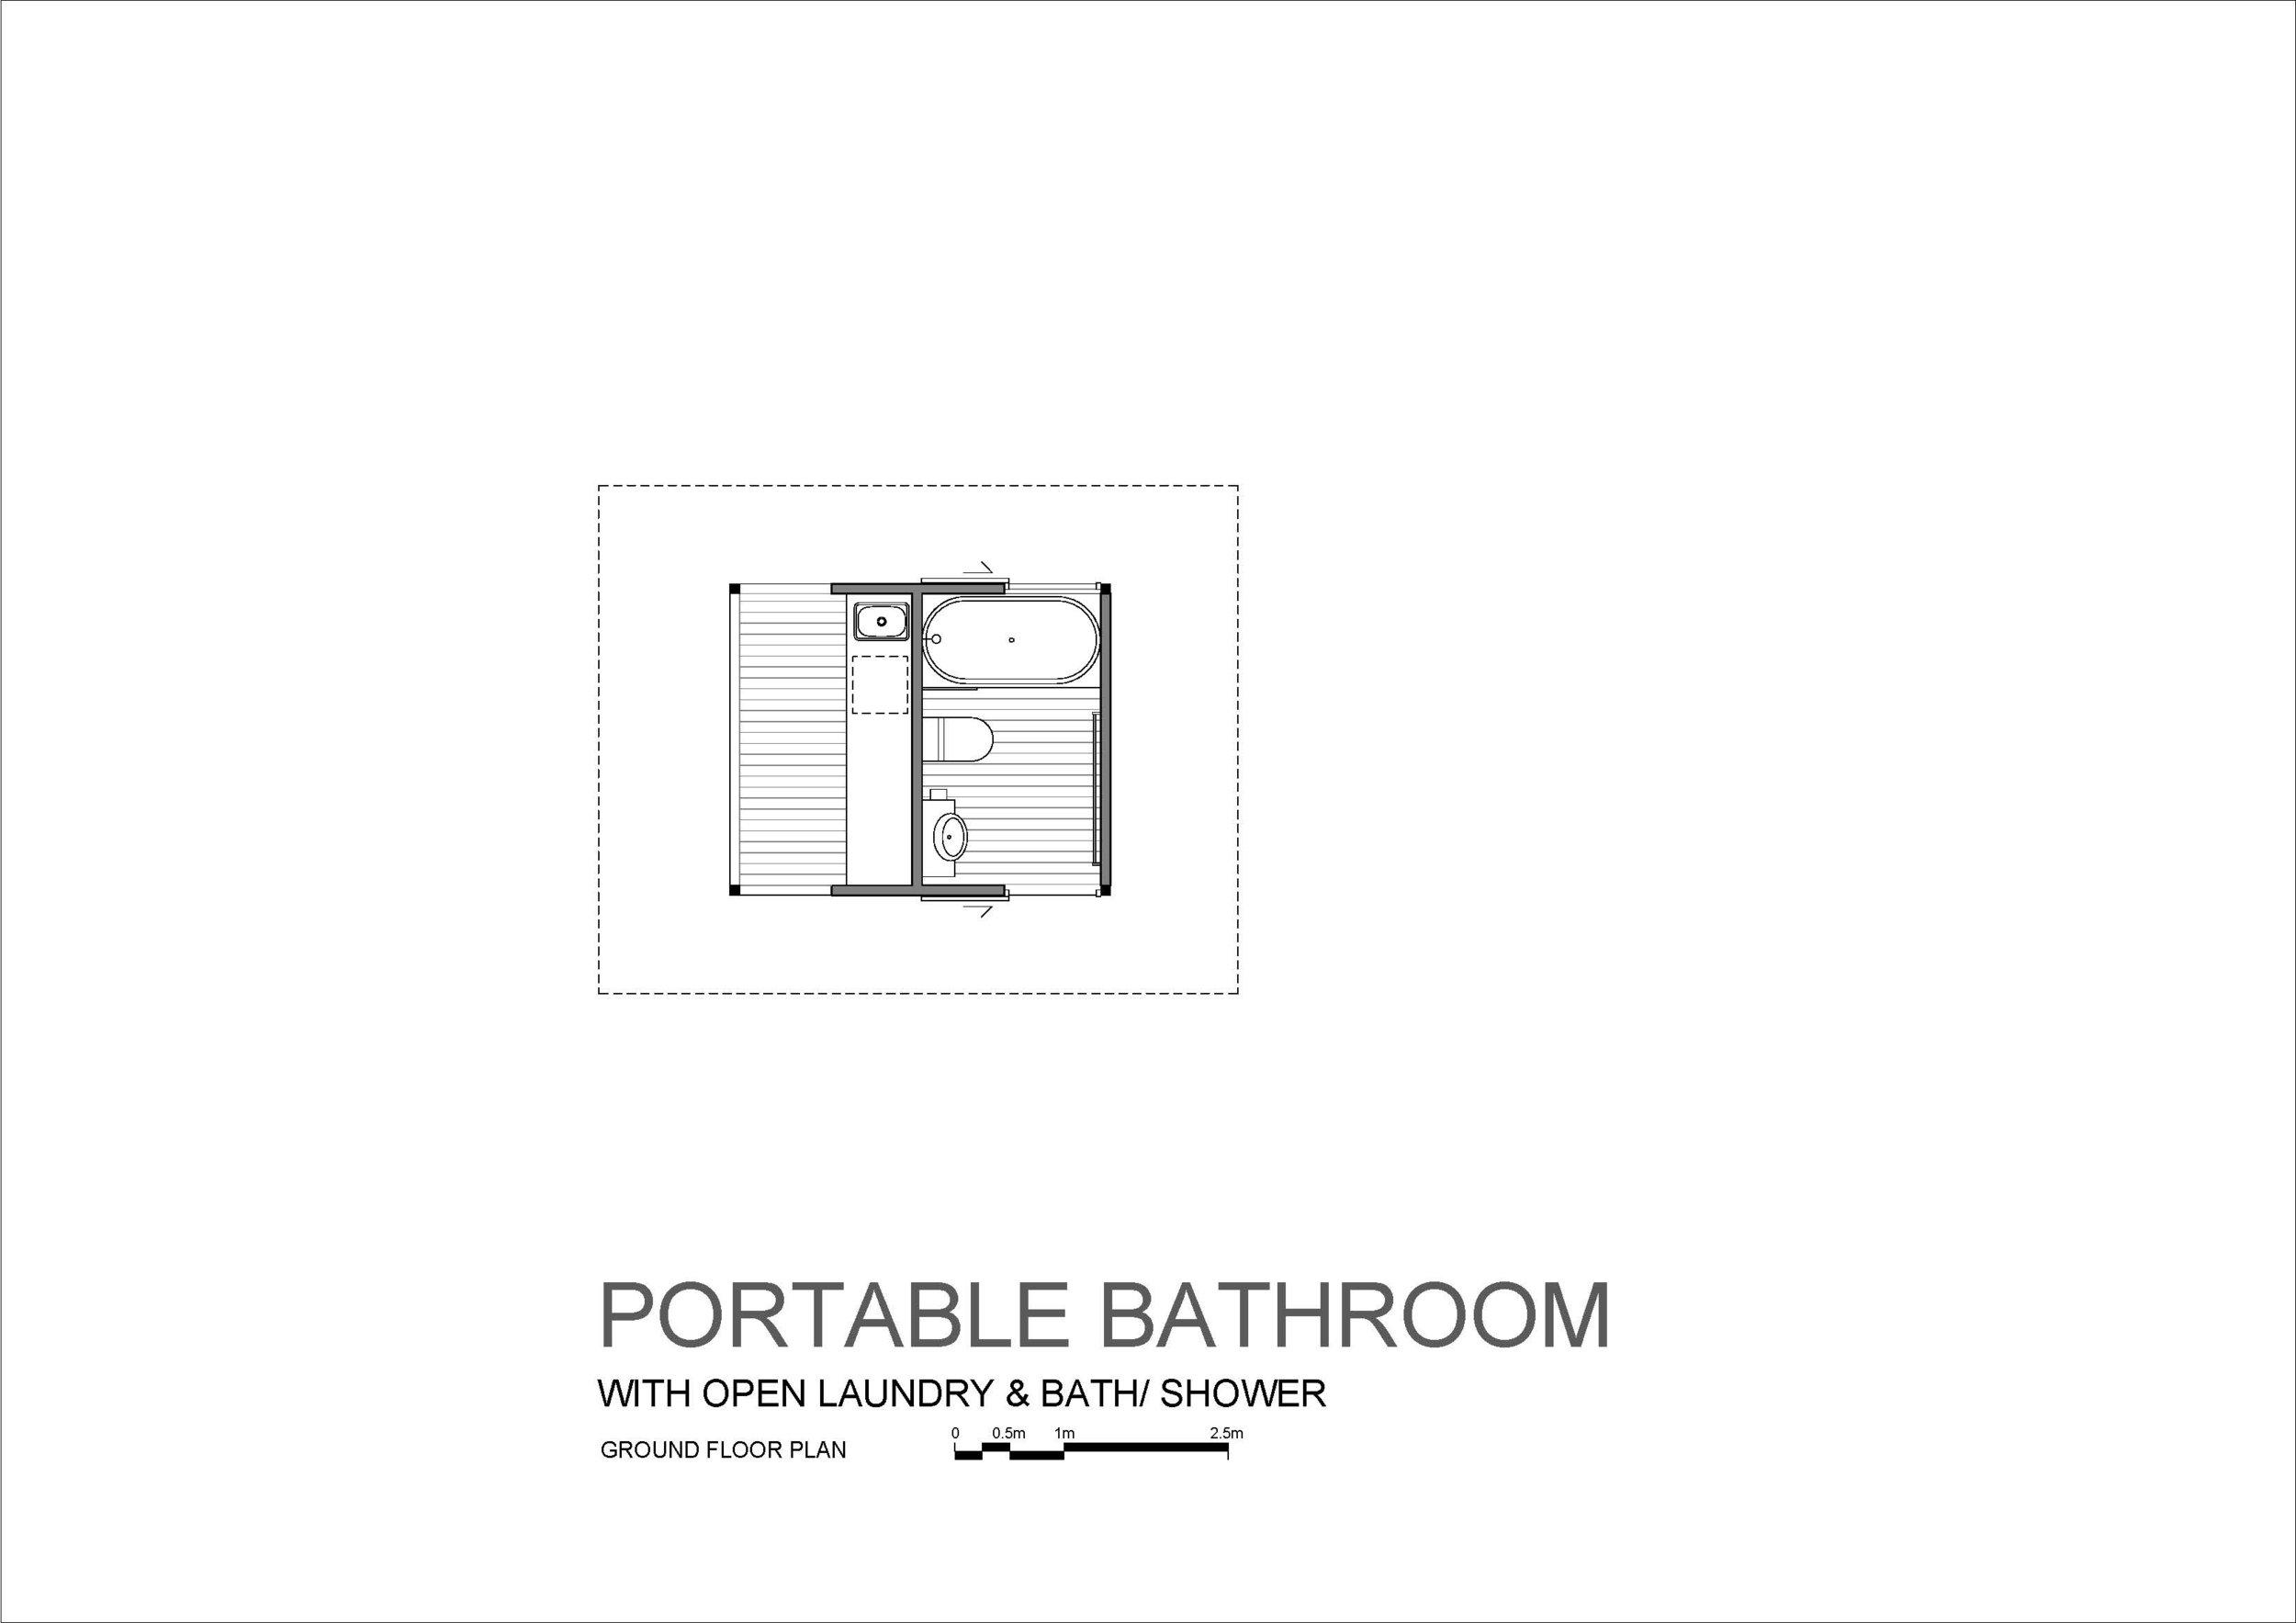 PORTABLE BATHROOM_Page_3.jpg